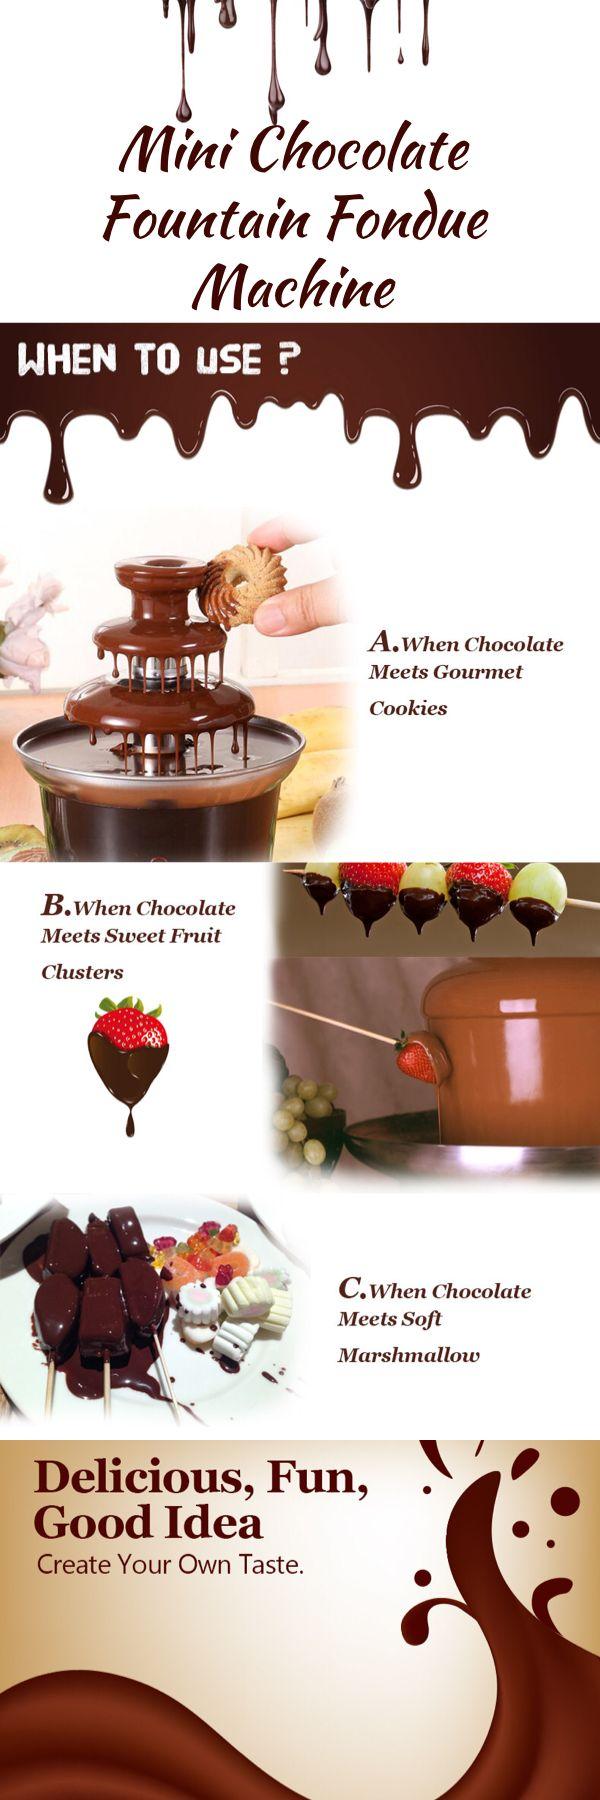 Mini Chocolate Fountain Fondue Machine | Home Decor & Party Decoration Gifts